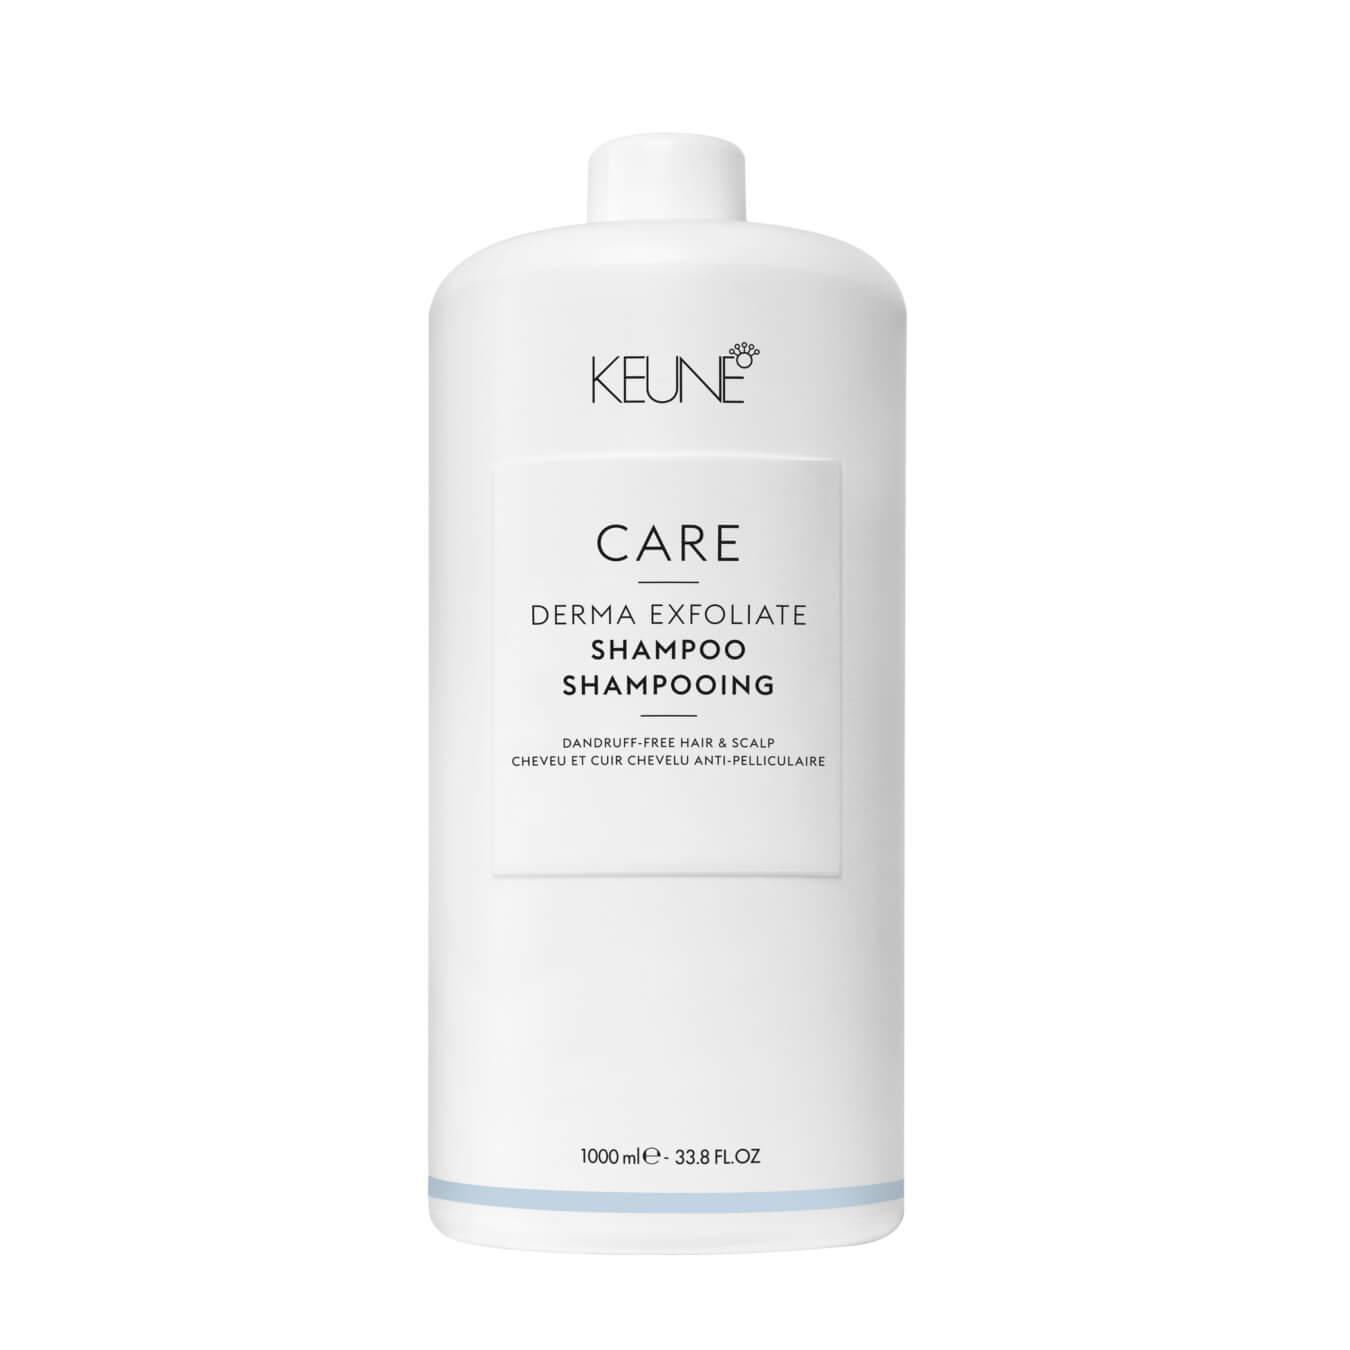 Koop Keune Care Derma Exfoliate Shampoo 1000ml